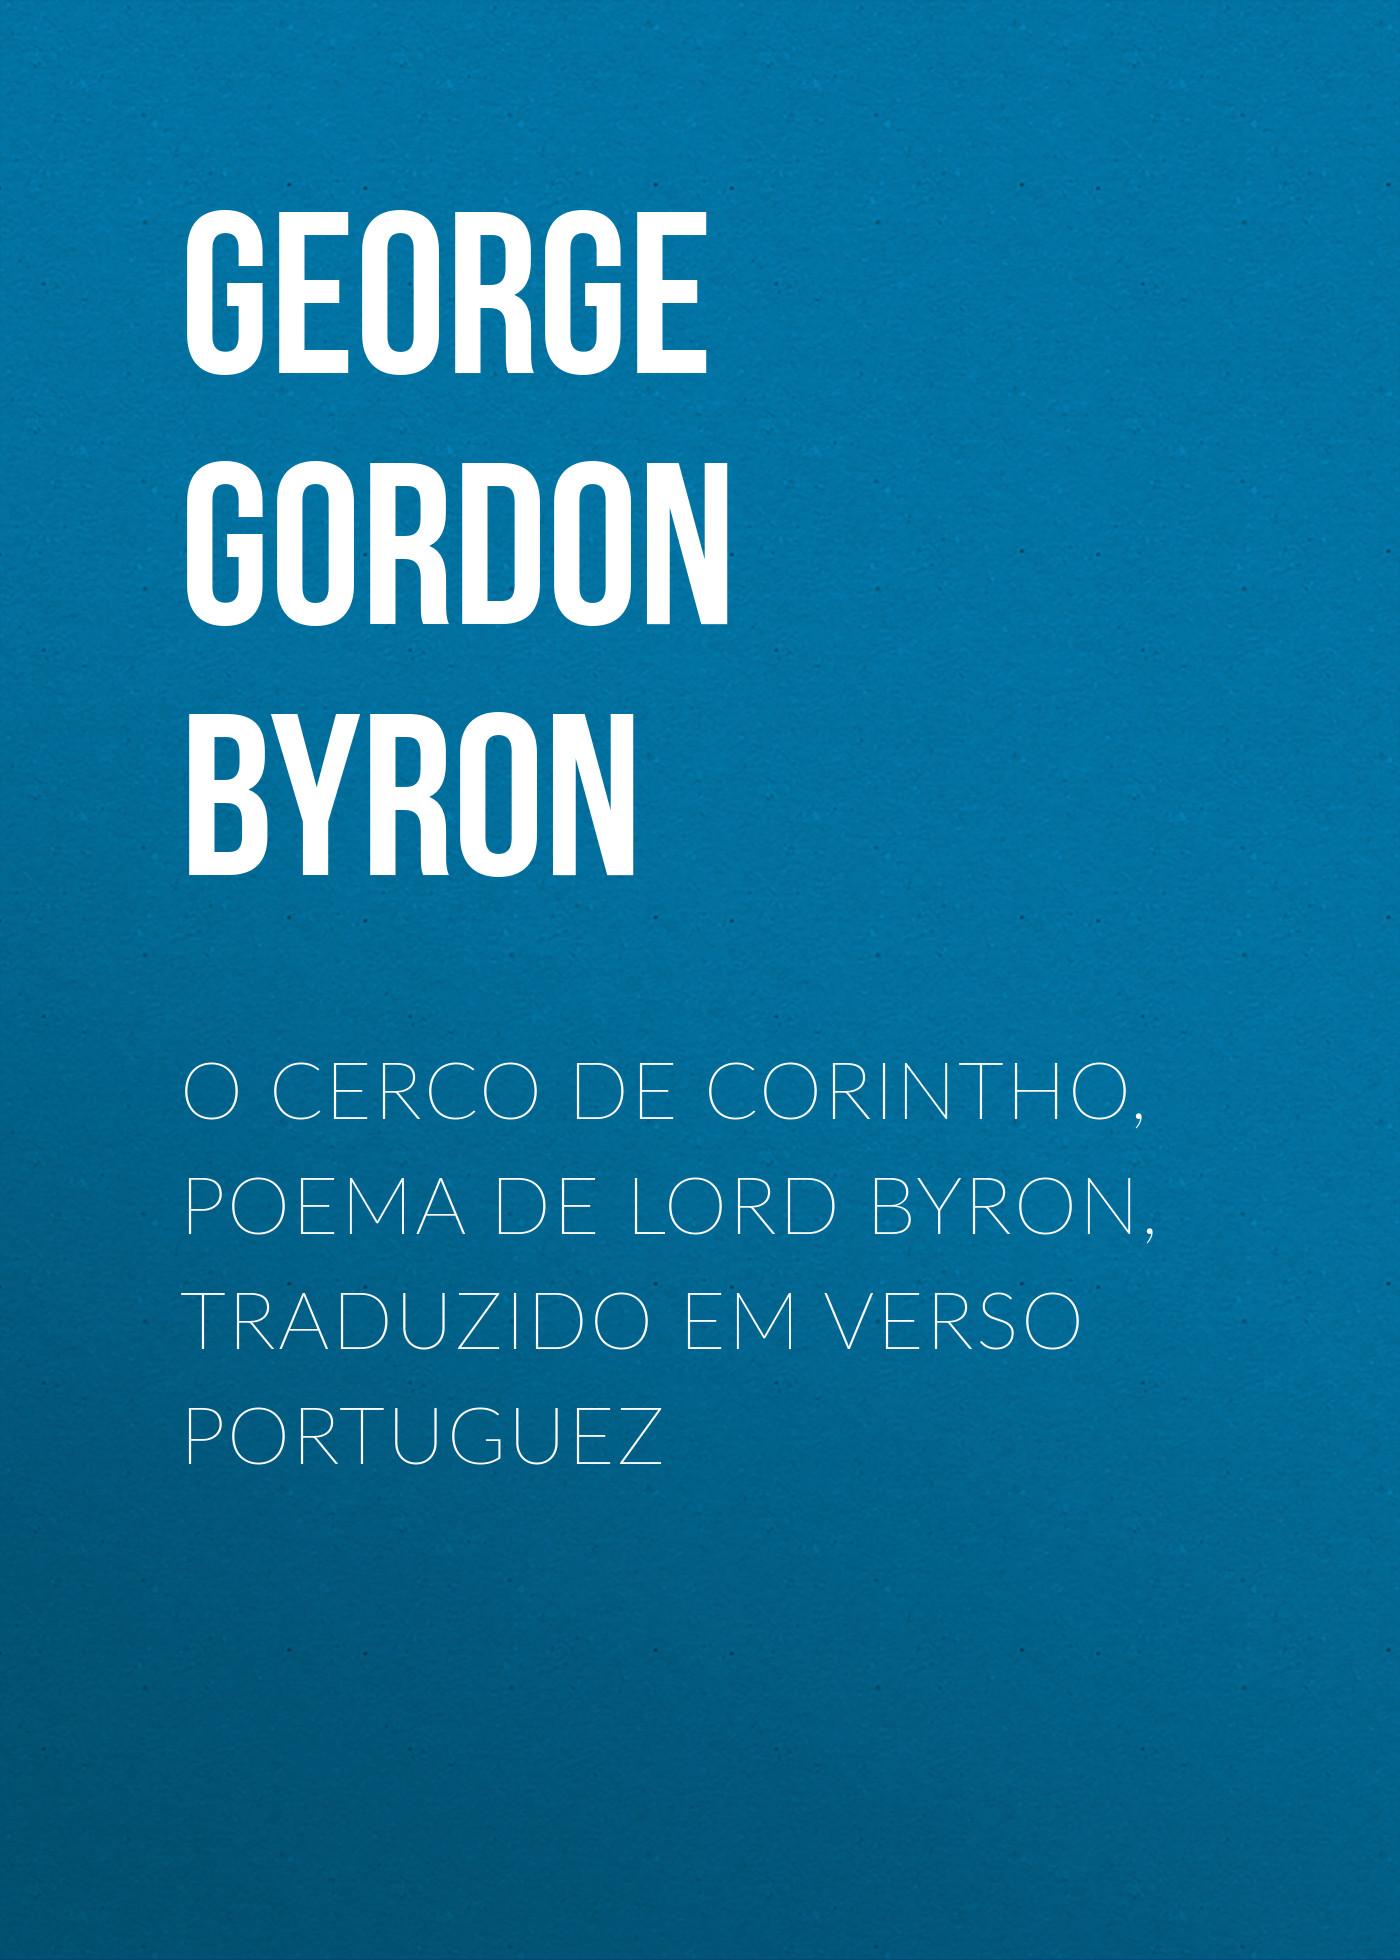 Джордж Гордон Байрон O Cerco de Corintho, poema de Lord Byron, traduzido em verso portuguez thomas medwin conversations of lord byron